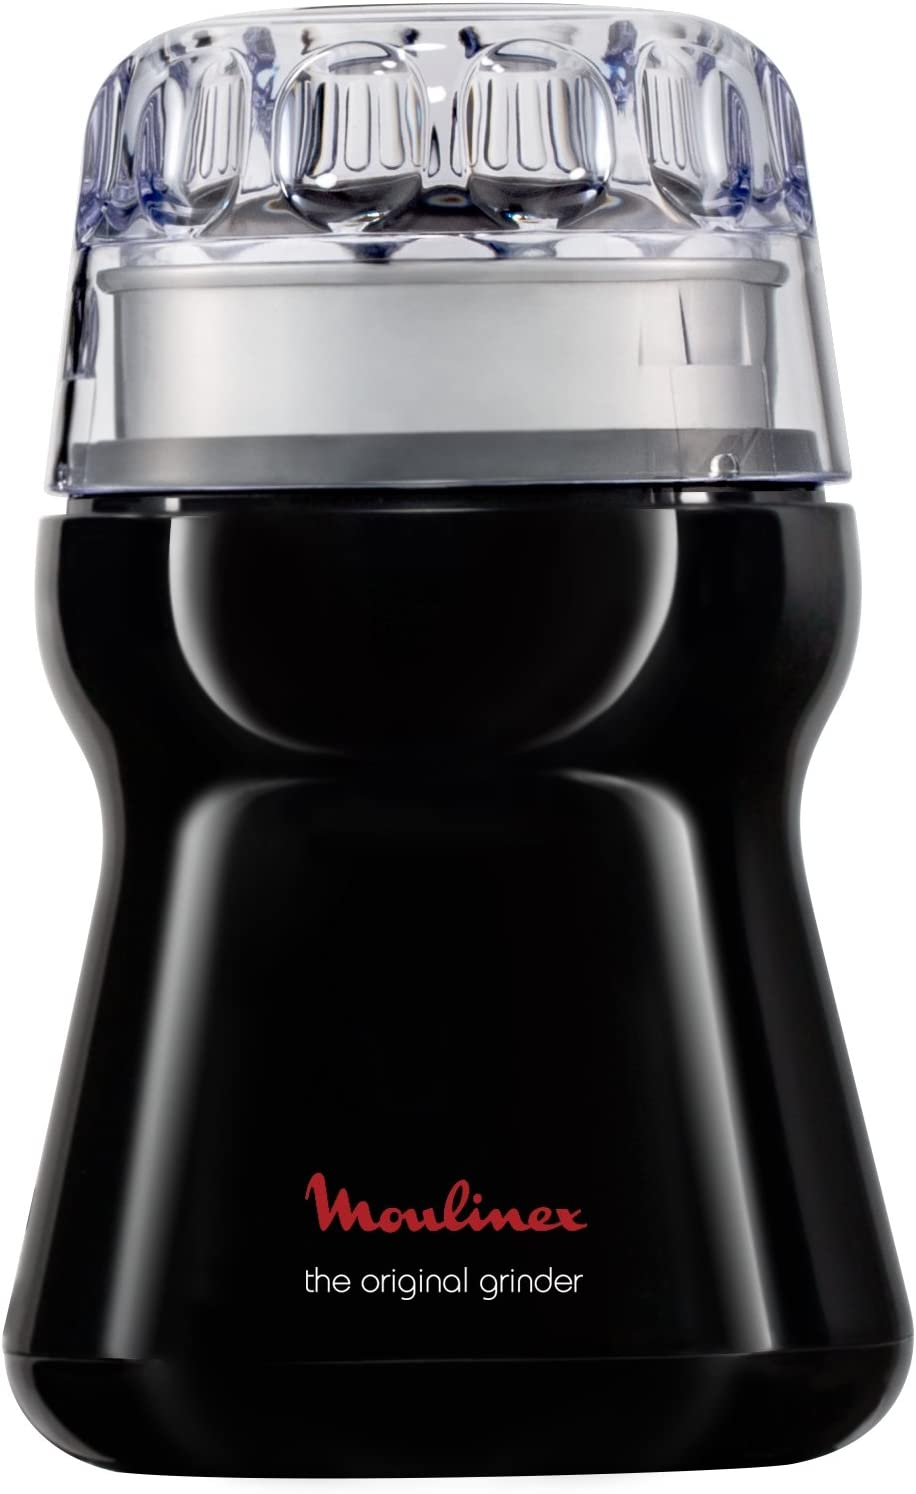 Moulinex AR1108 Molinillo Cafe AR110830 50G Grinder Negro, 180 W ...